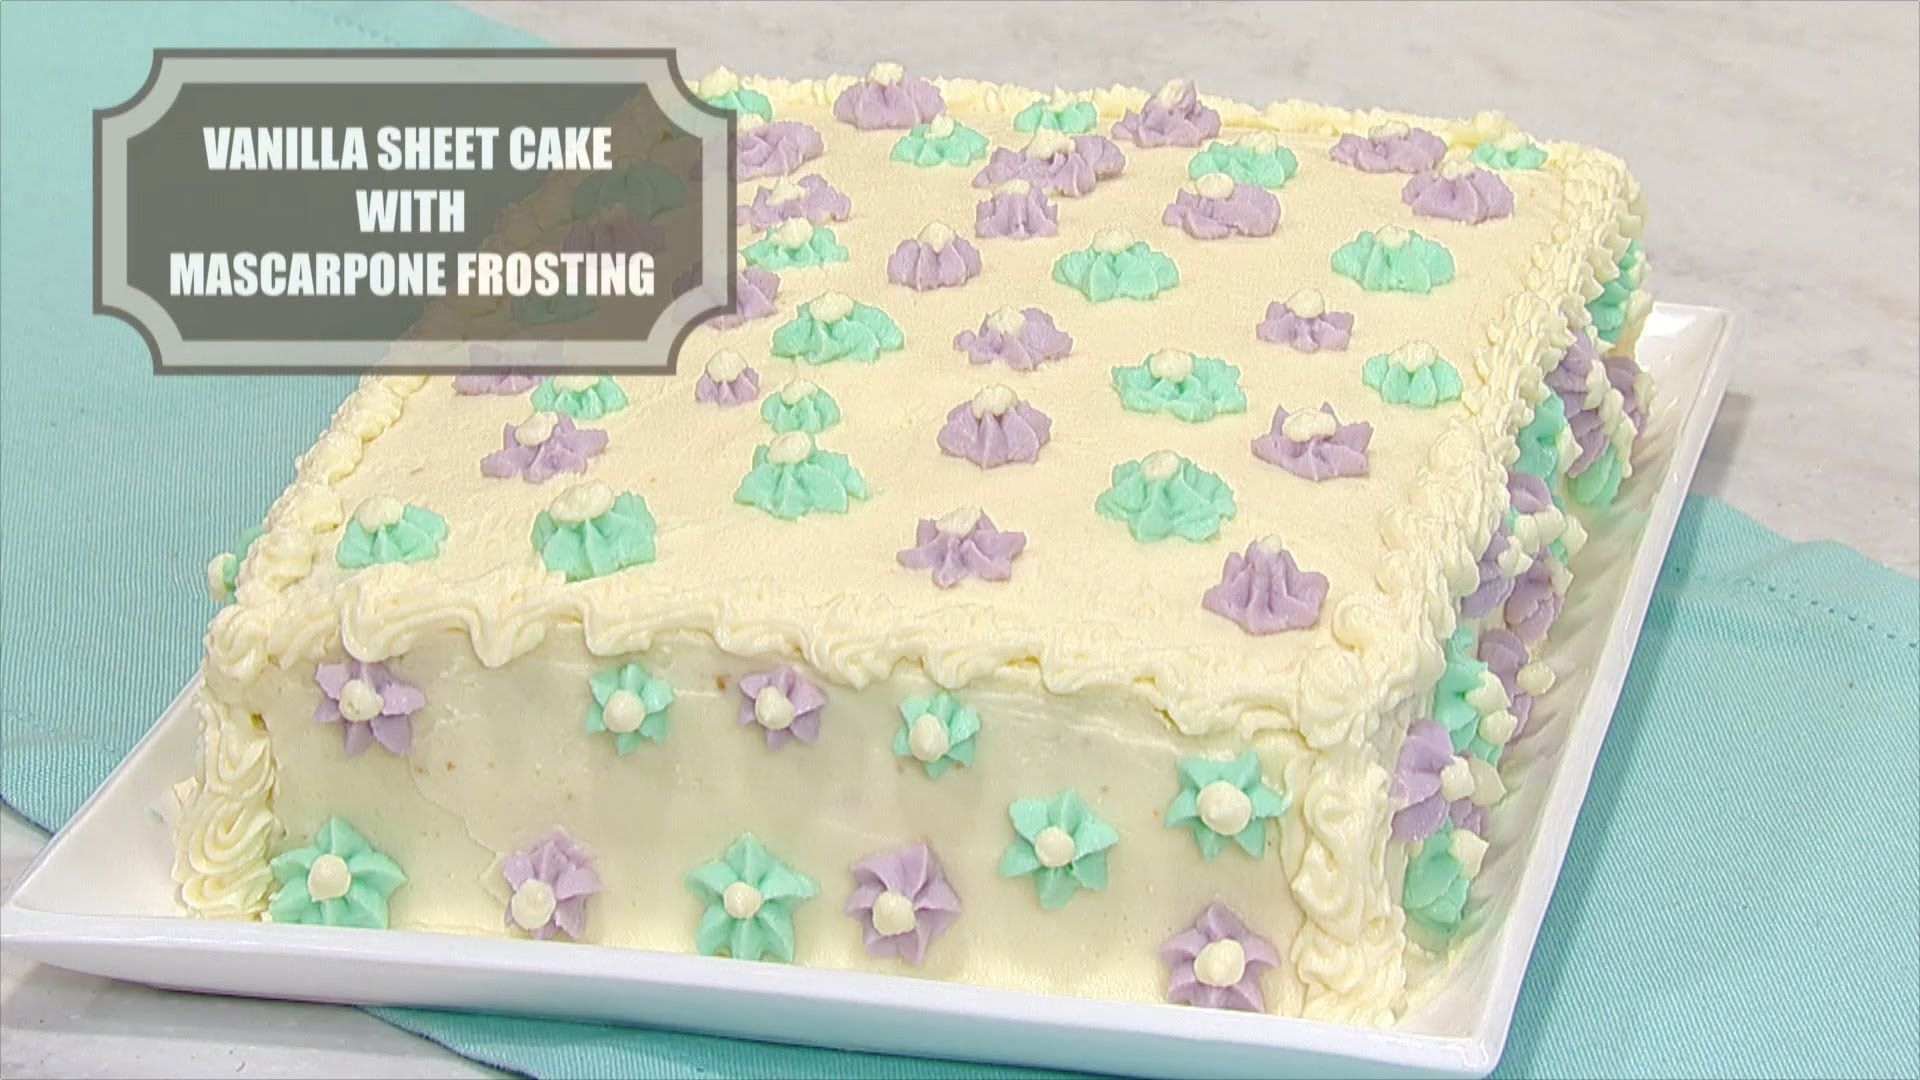 Vanilla Sheet Cake with Mascarpone Frosting — Dessert Recipe